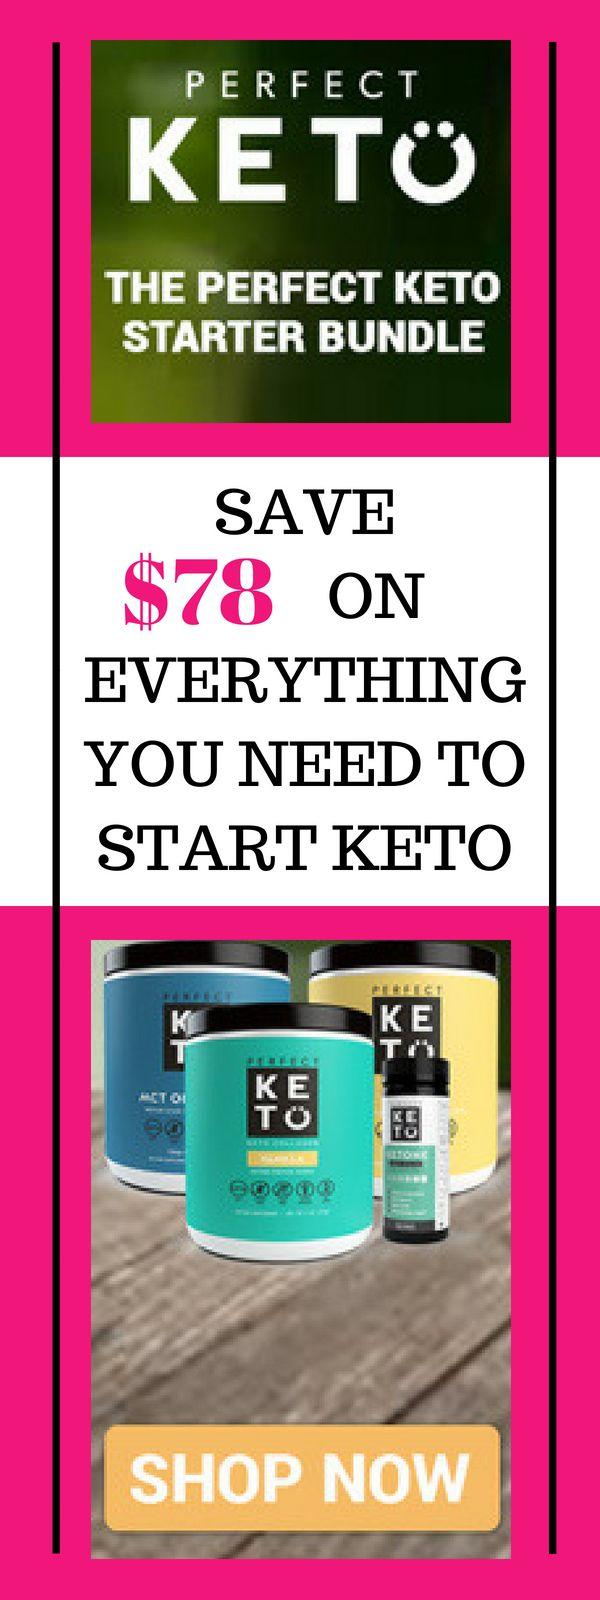 The Perfect Keto Starter Bundle